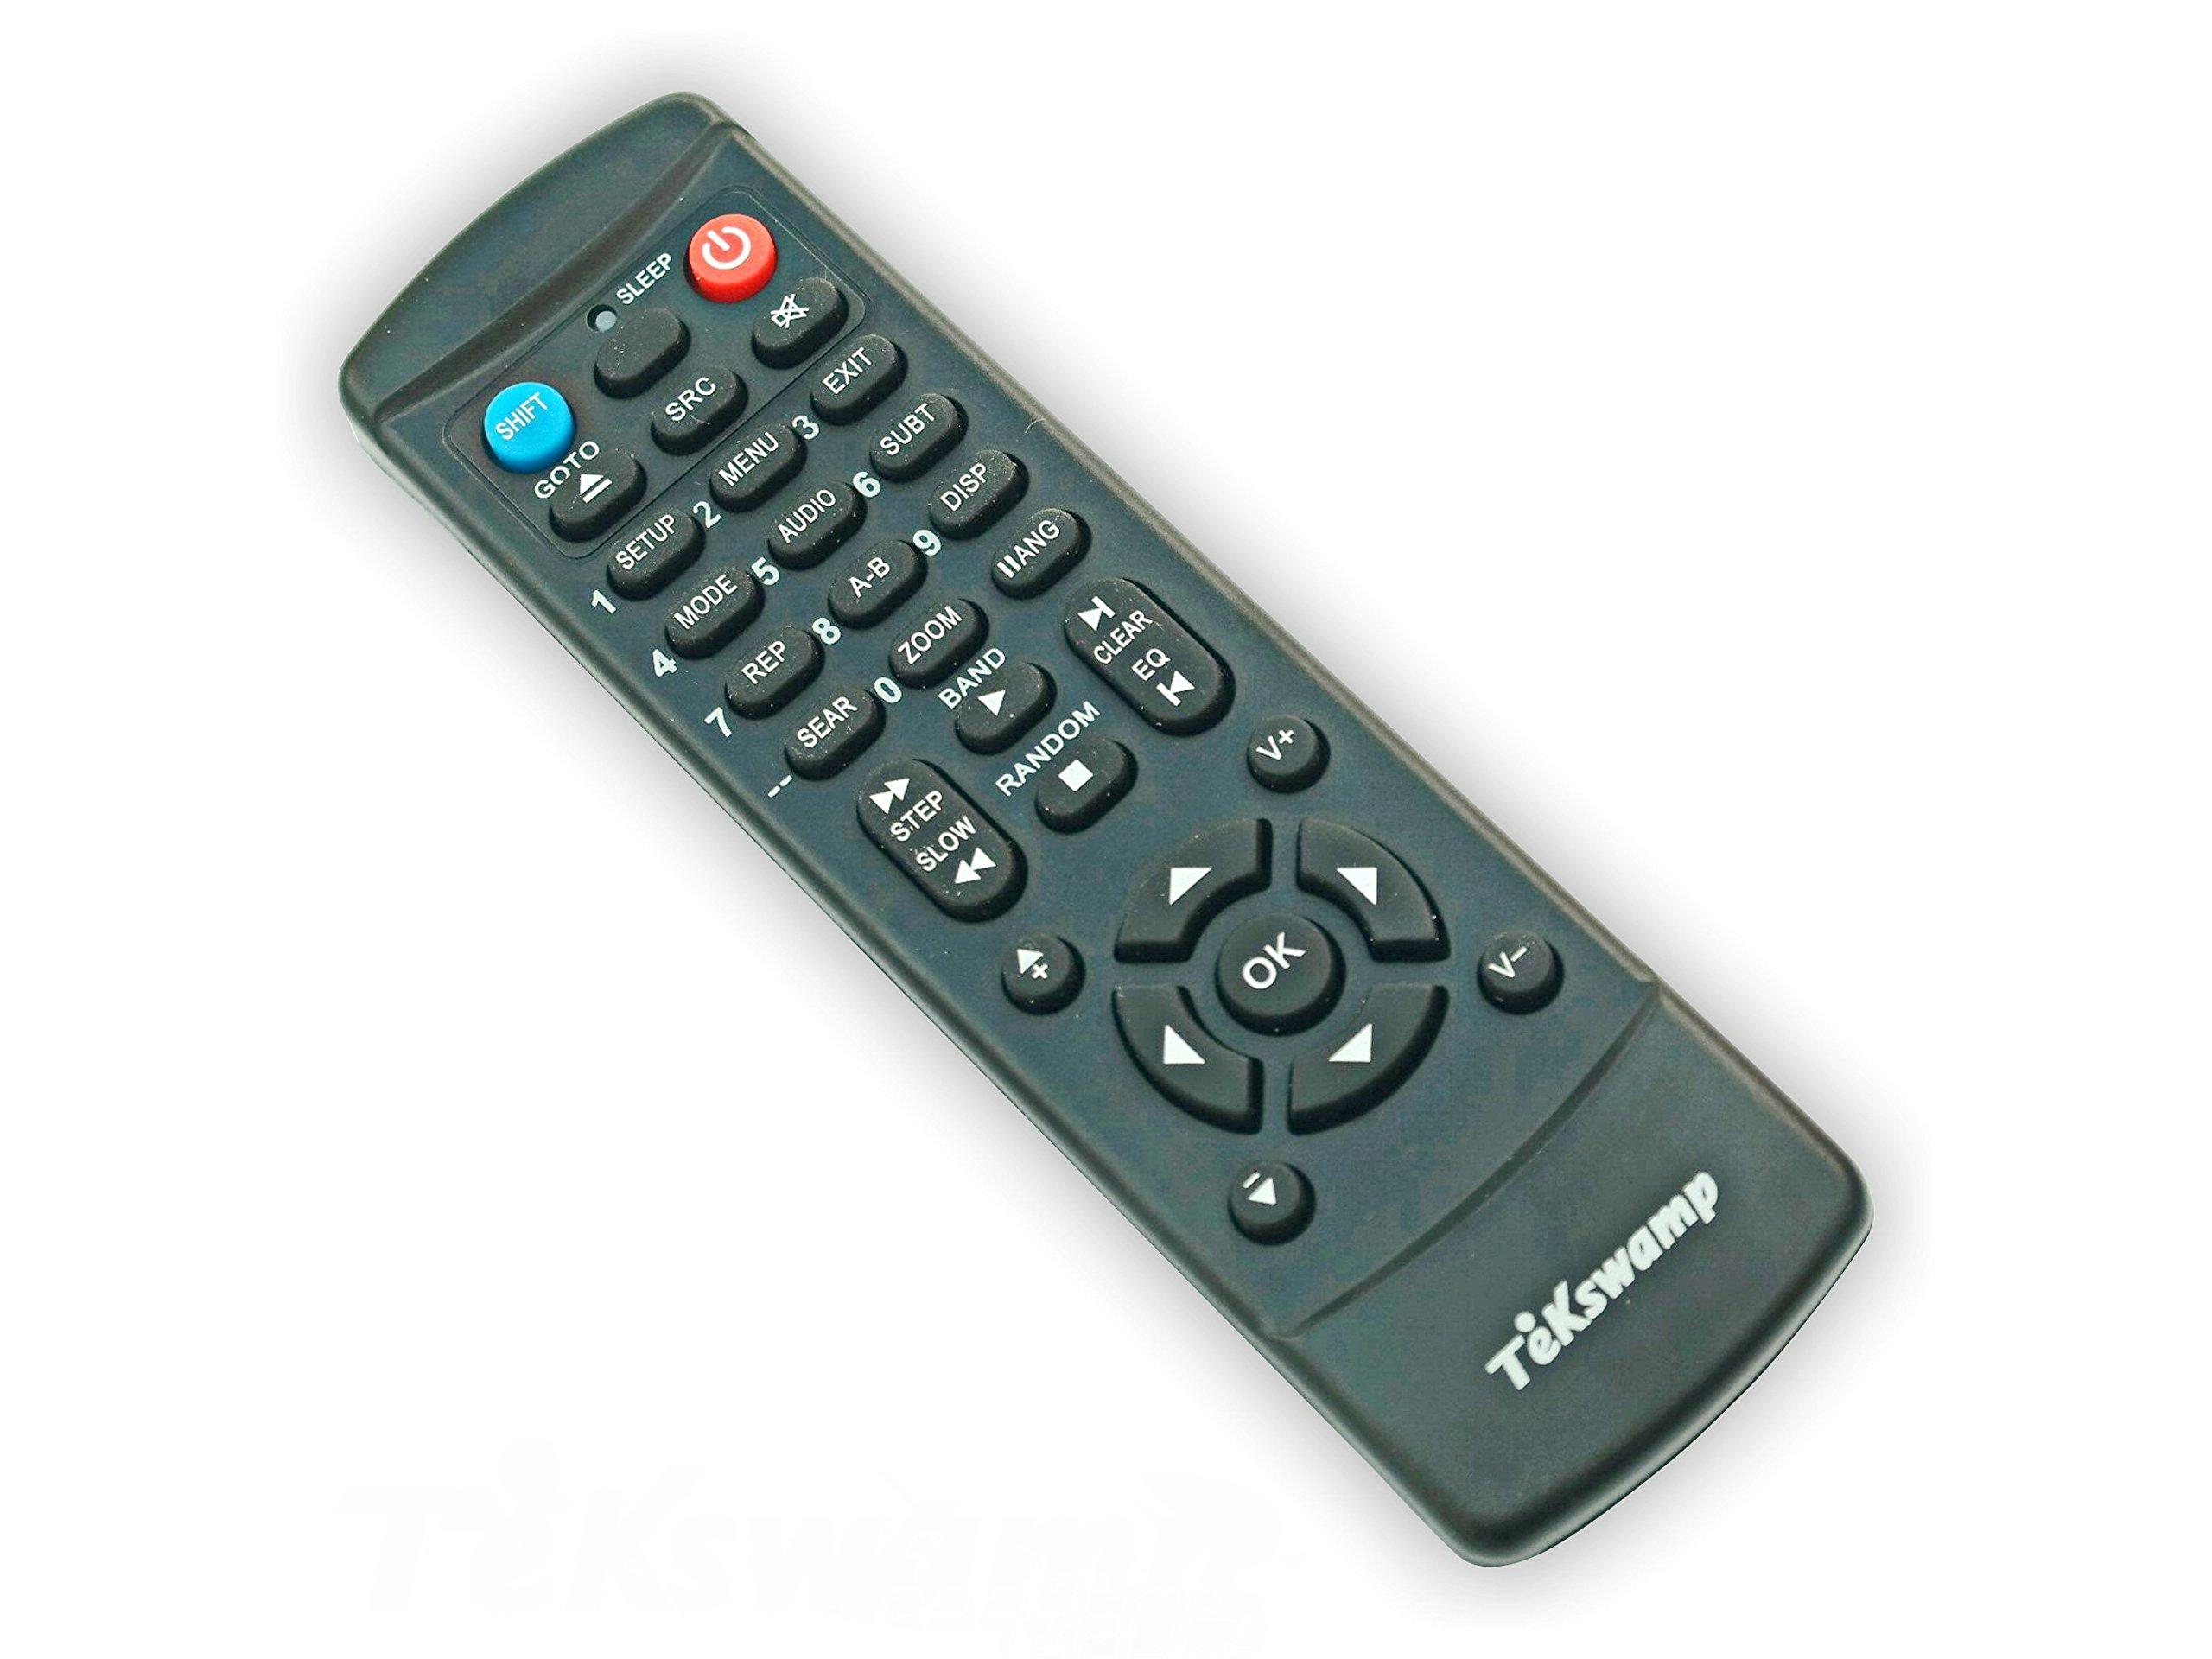 Toshiba SD-6100KU2 TeKswamp Remote Control by Tekswamp (Image #4)